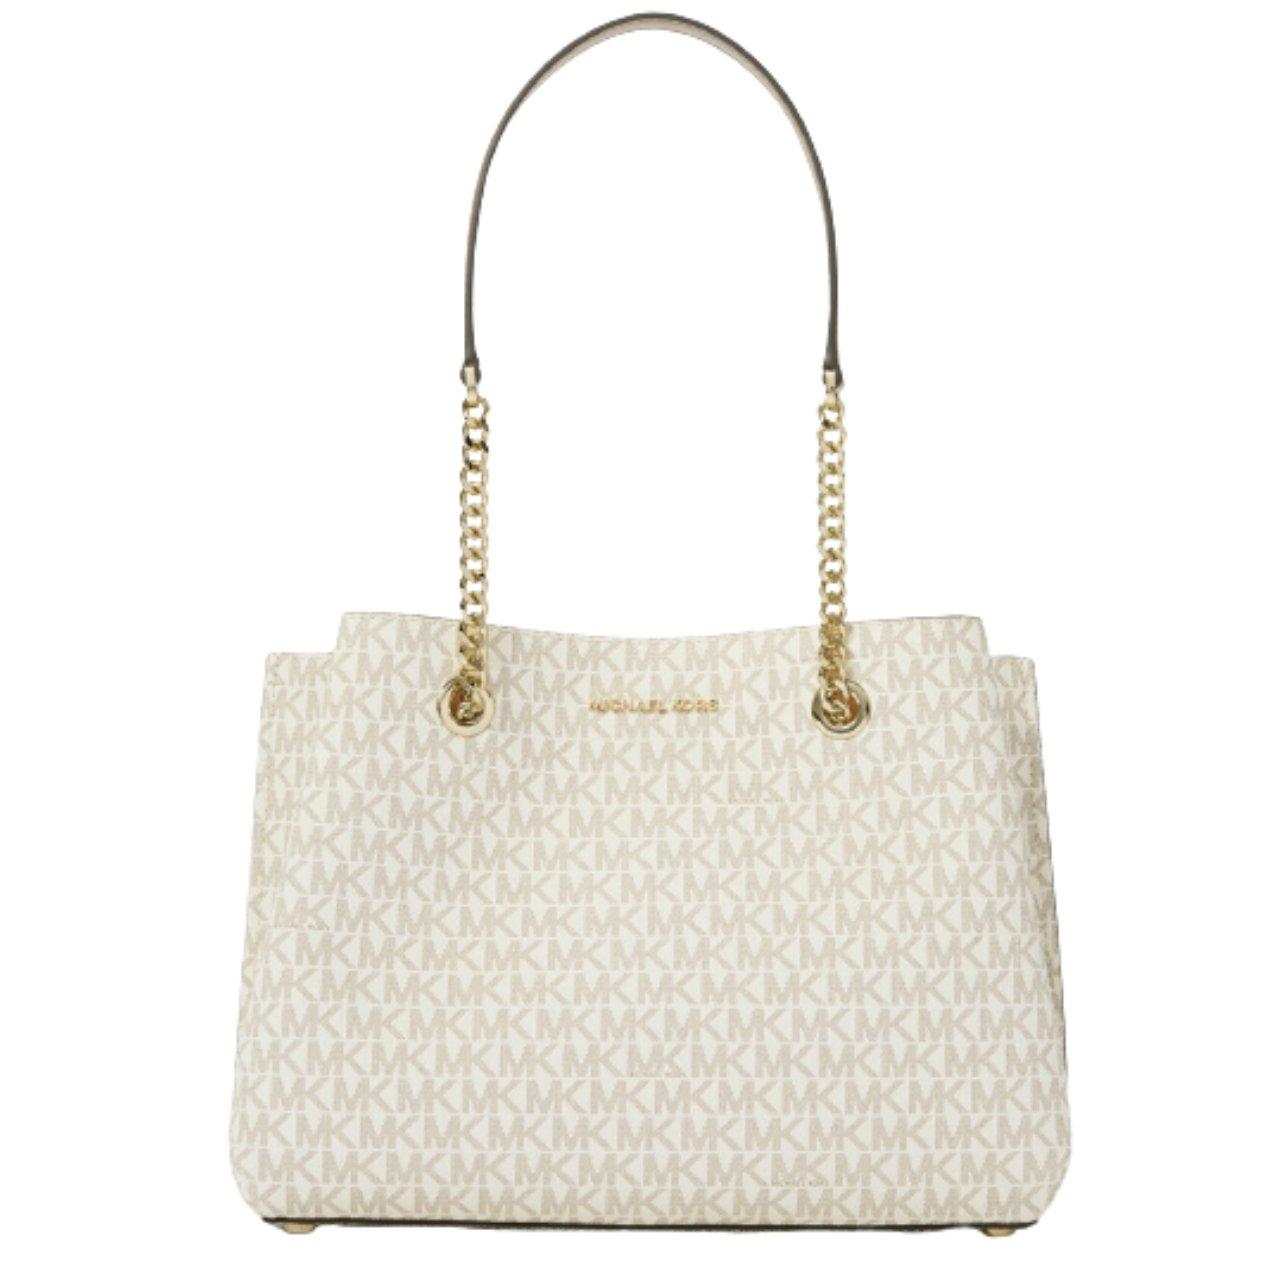 Michael Kors Women's Teagen Large Long Drop Tote Bag White MK27572